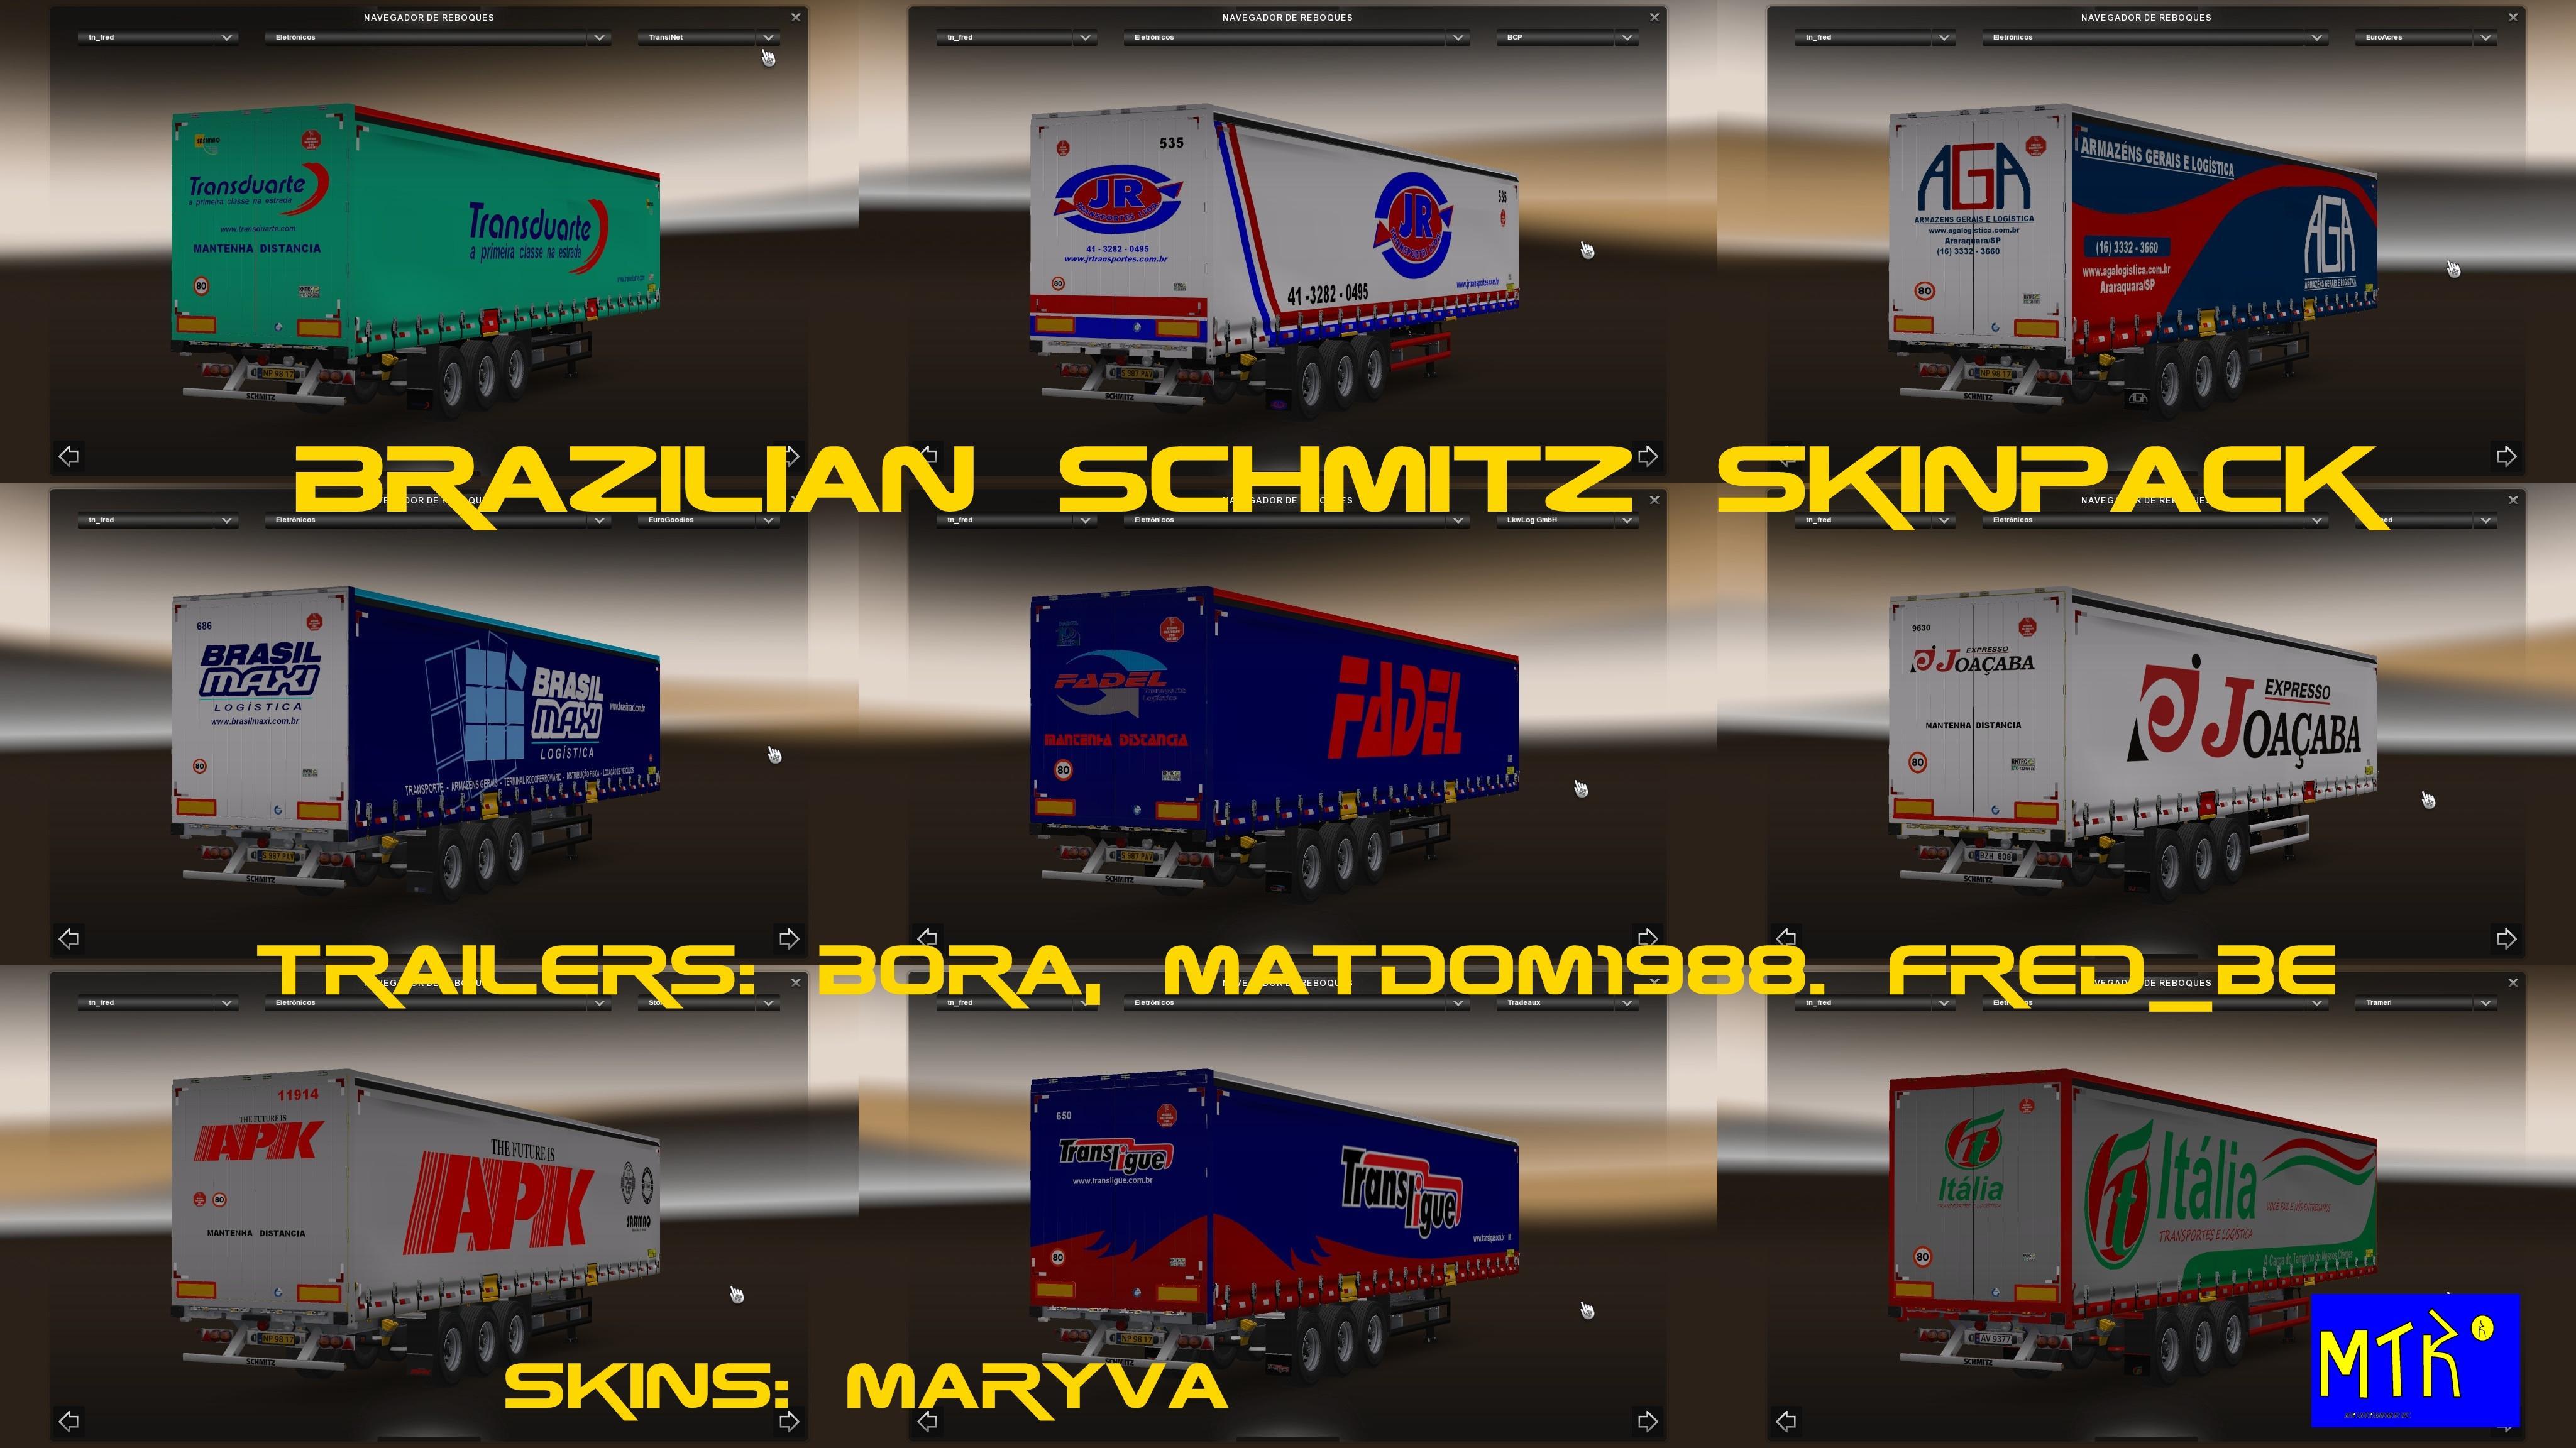 BRAZILIAN SCHUMITZ SKINPACK For ETS 2 -Euro Truck